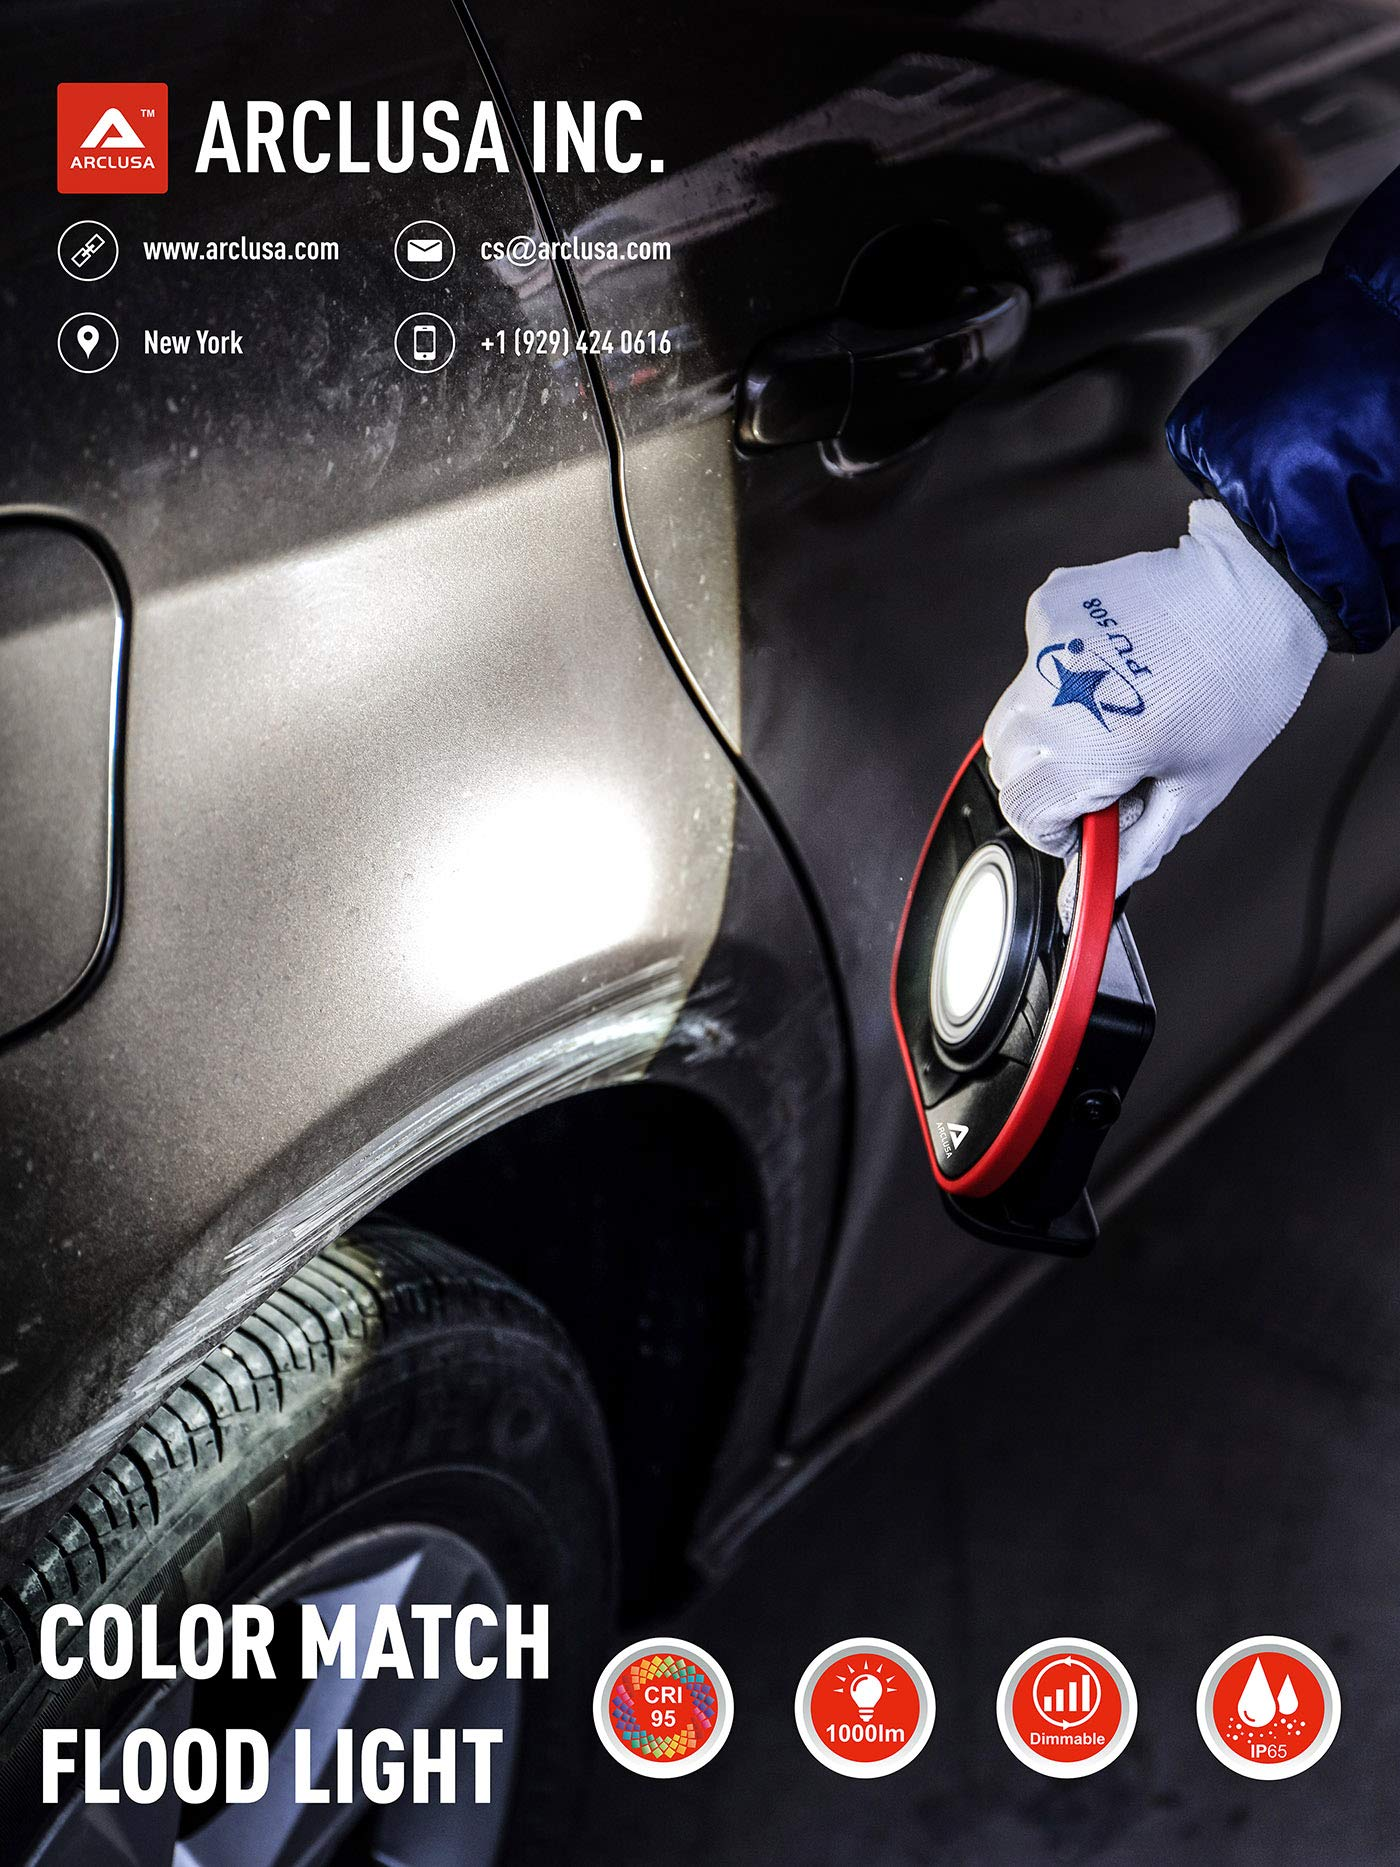 Arclusa COB LED Rechargeable Sunlight Color Match Paint Work Light Adjustable Holder Magnet Bottom Flood Light(1000 Lumen Color Match) by Arclusa (Image #3)